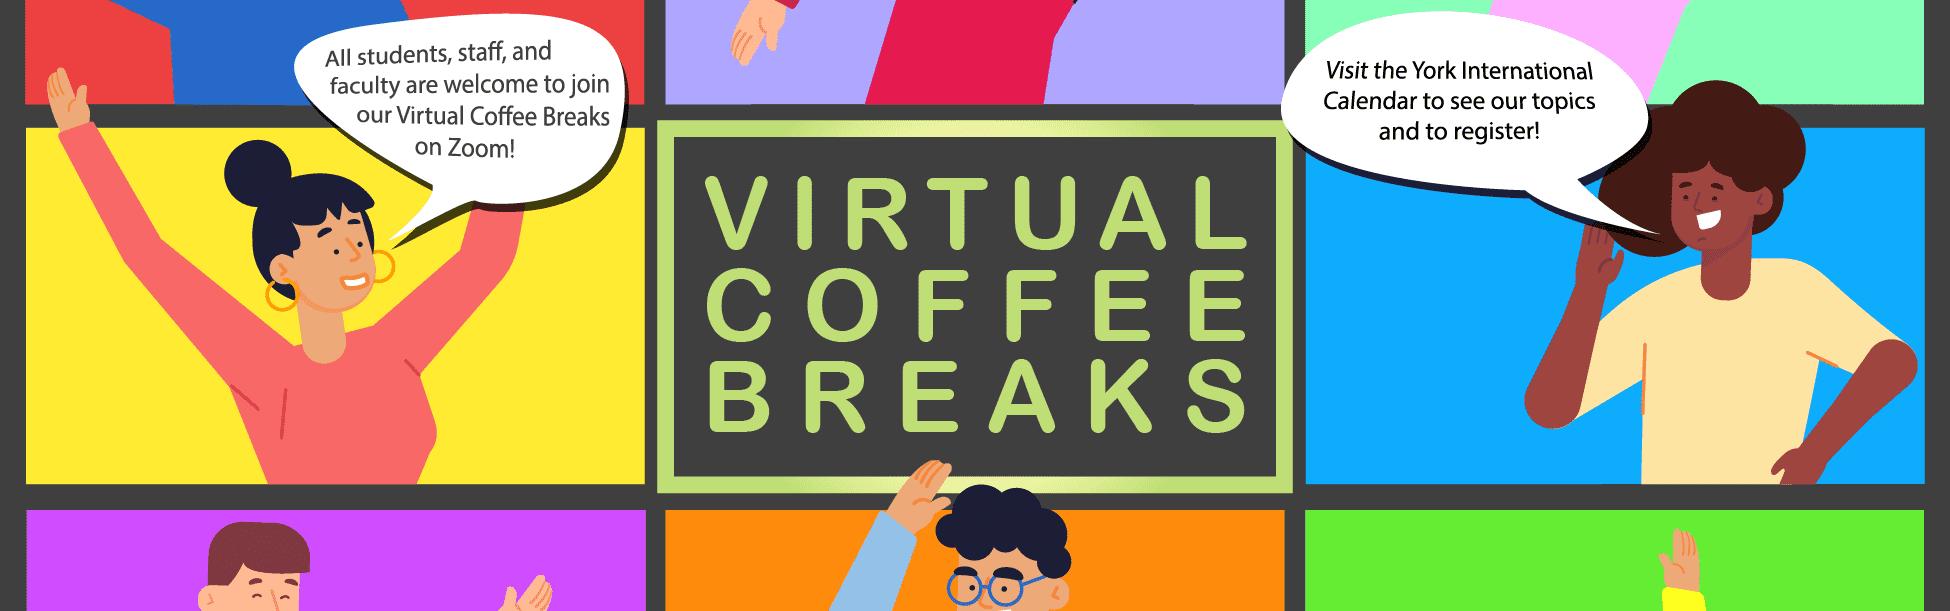 Virtual Coffee Break